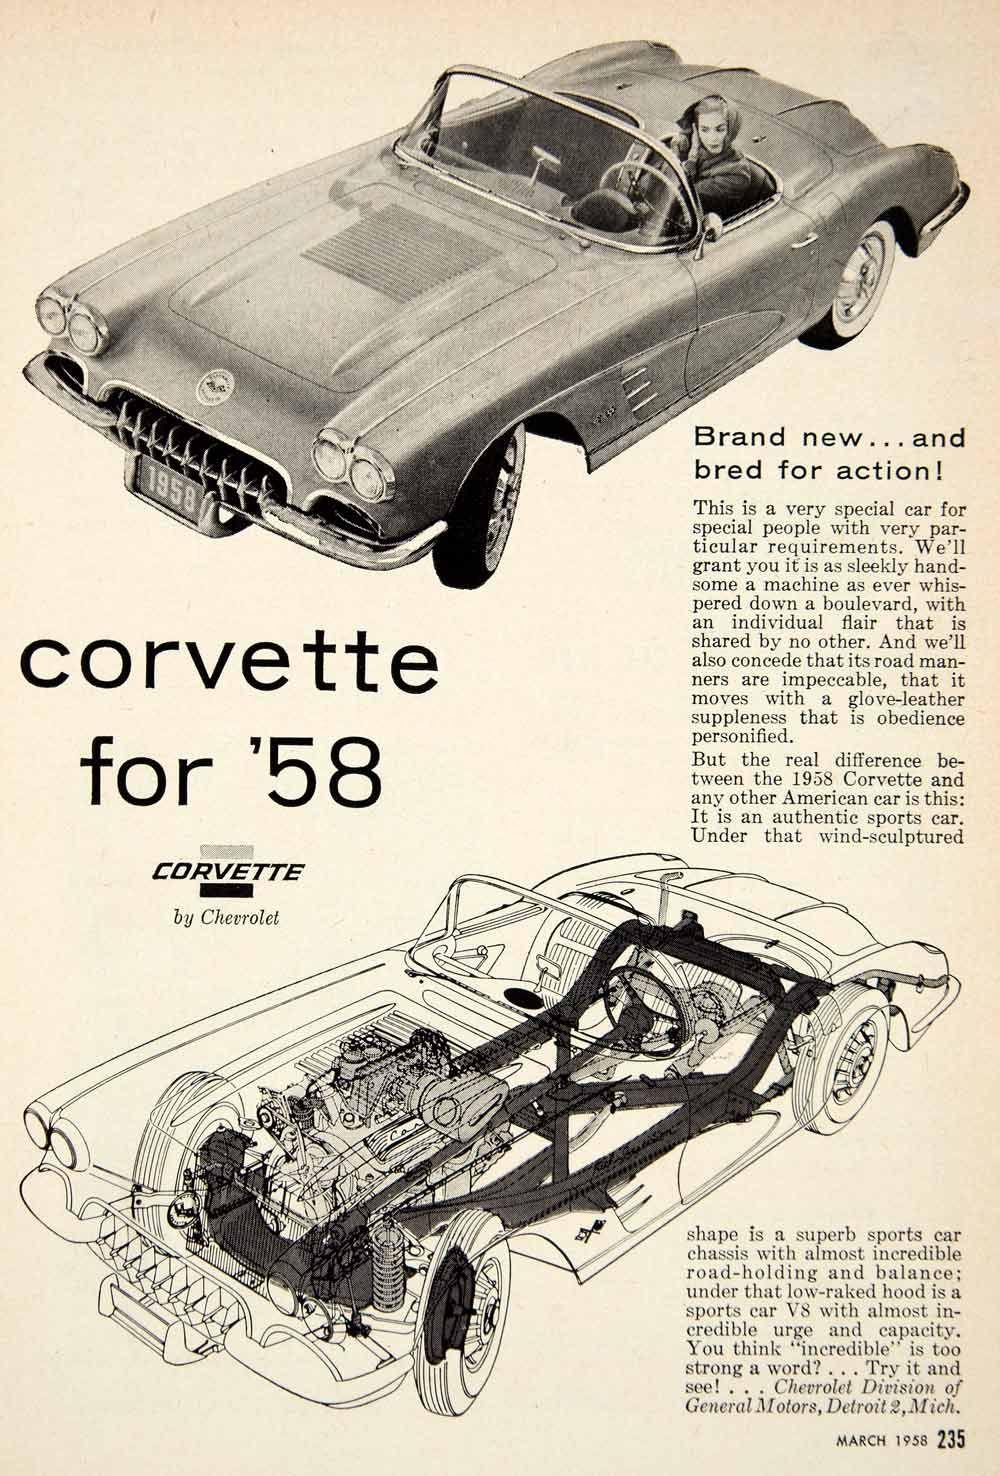 1958 ad for the 1958 Chevrolet Corvette 2door convertible sports